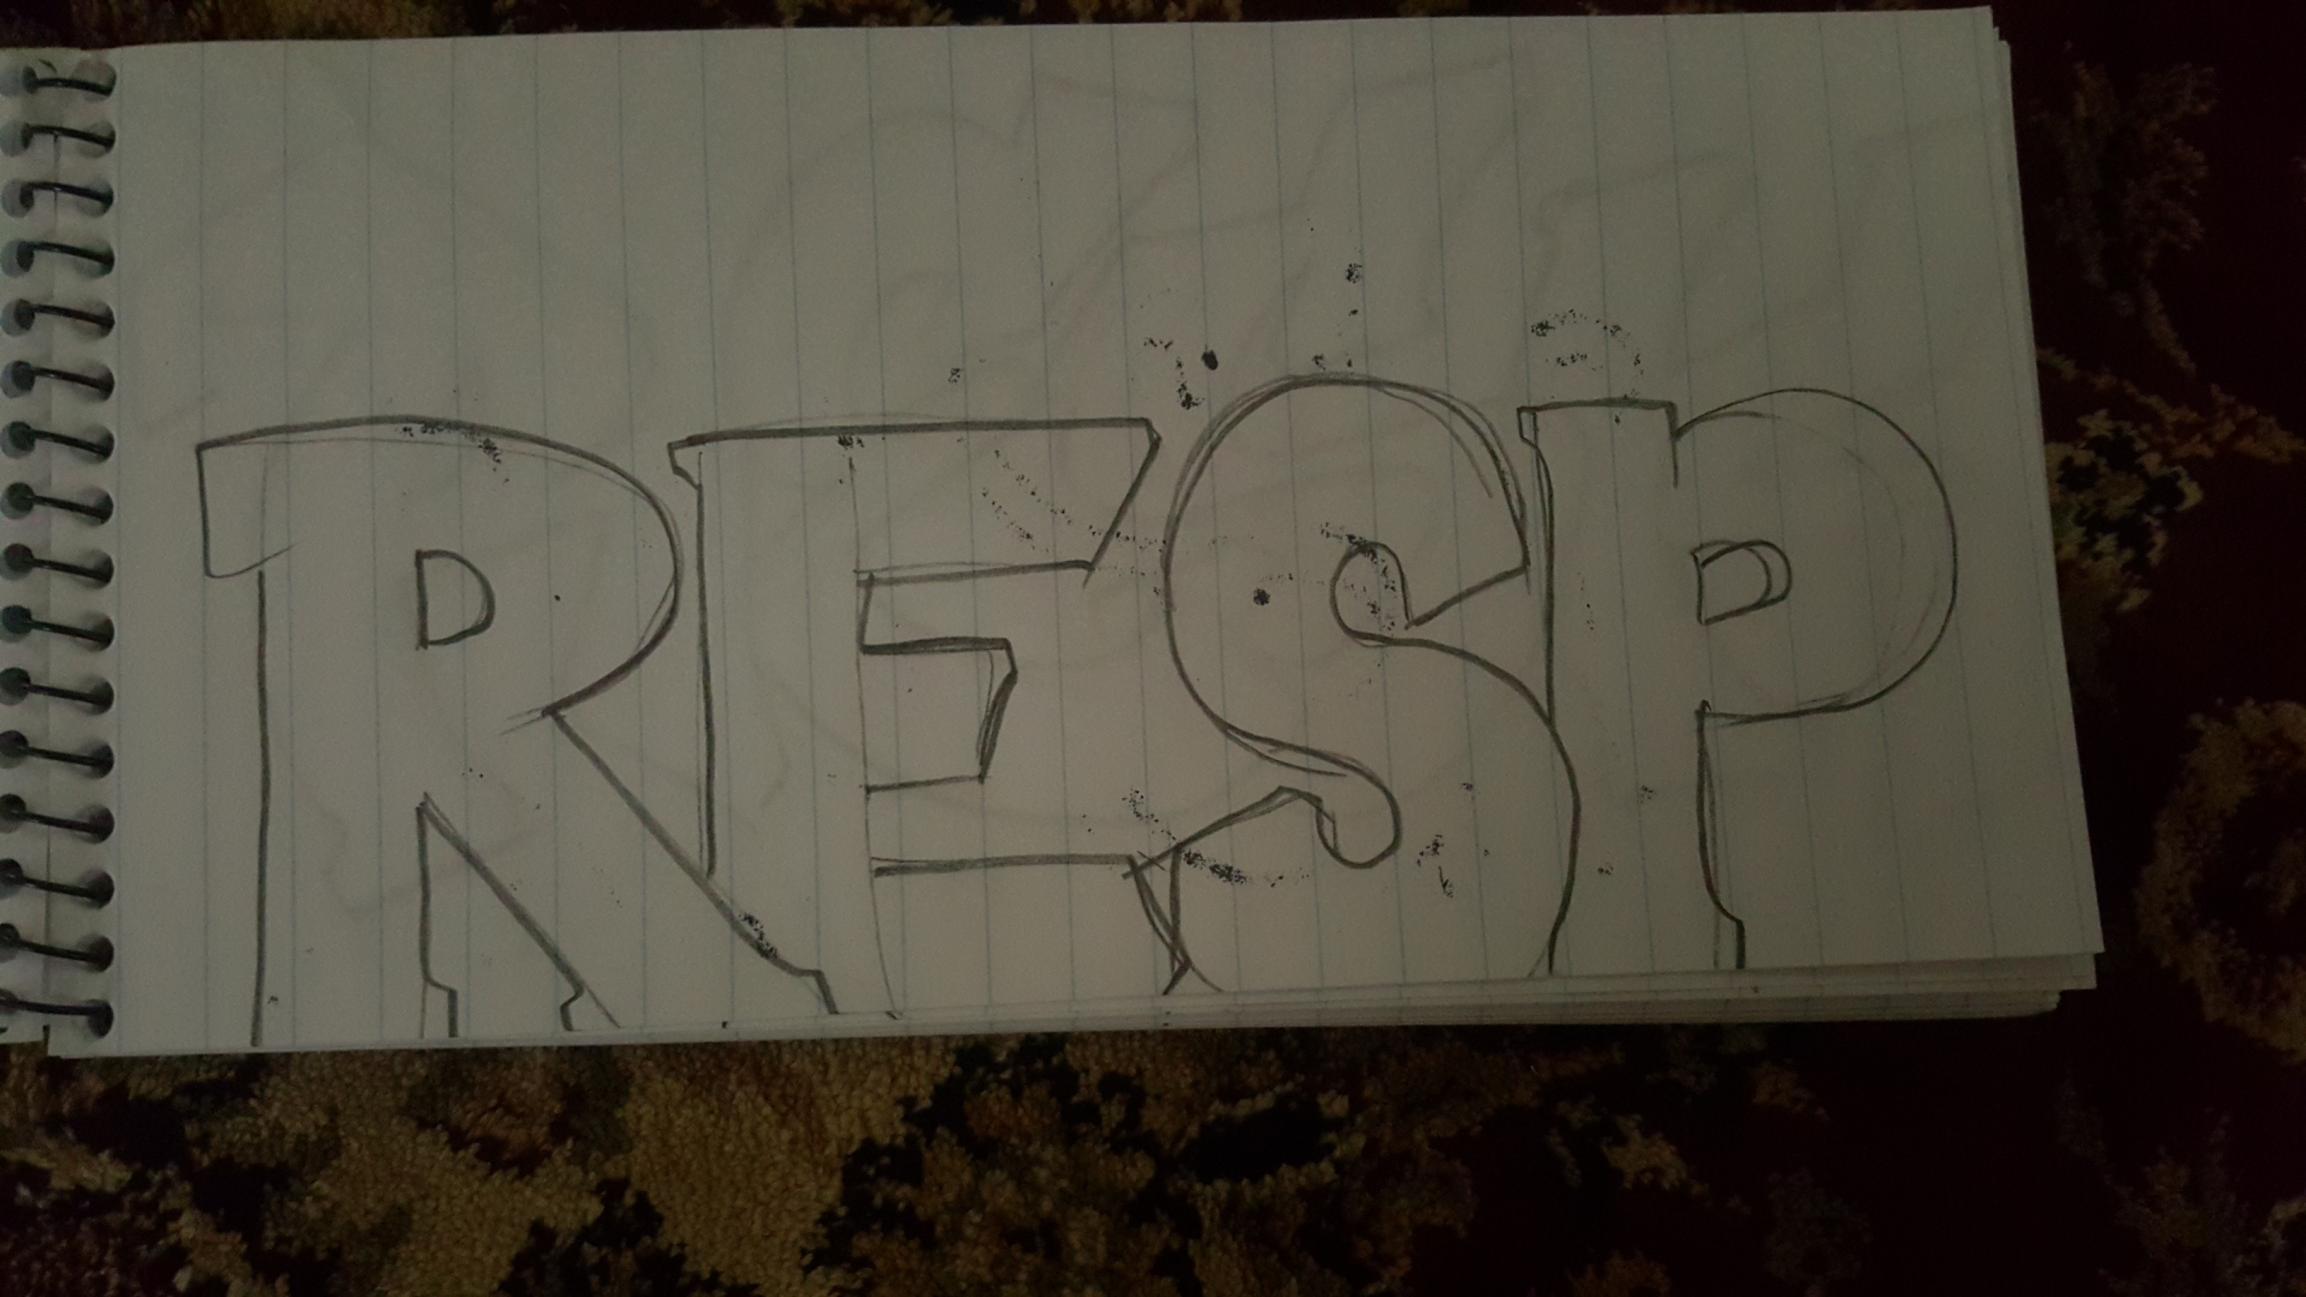 RESP2.jpg